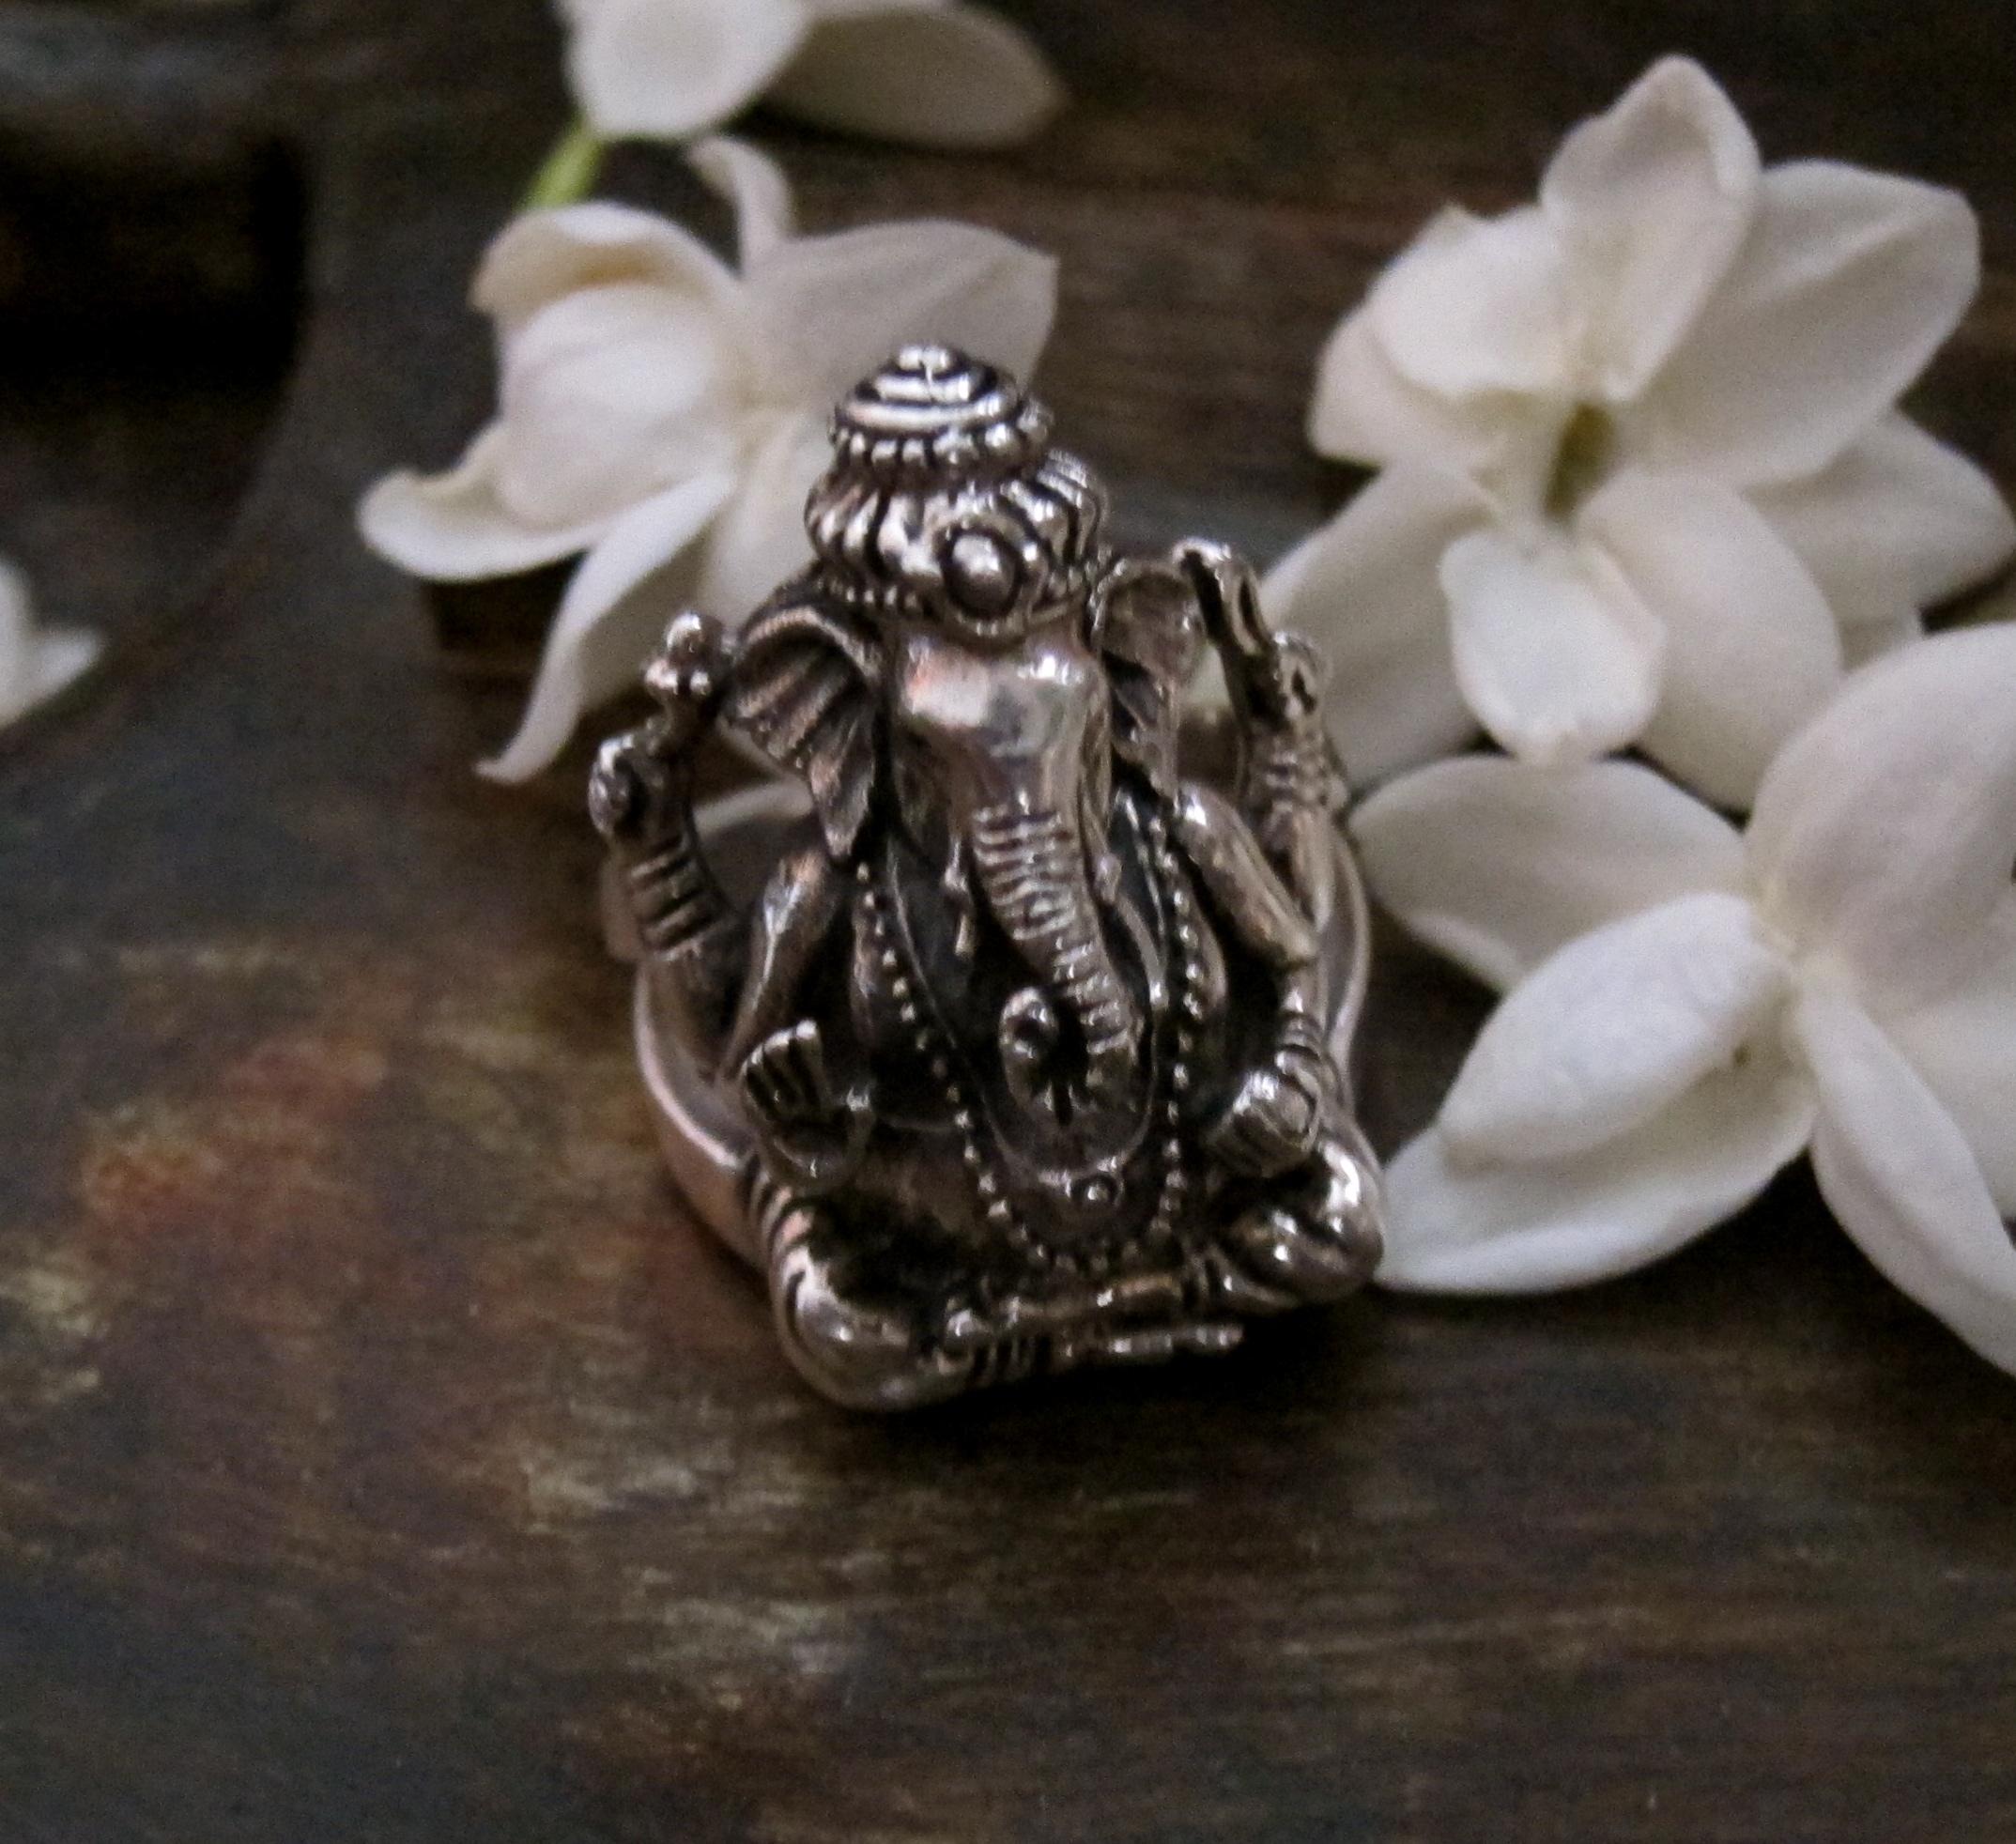 The Rocker Ganesha